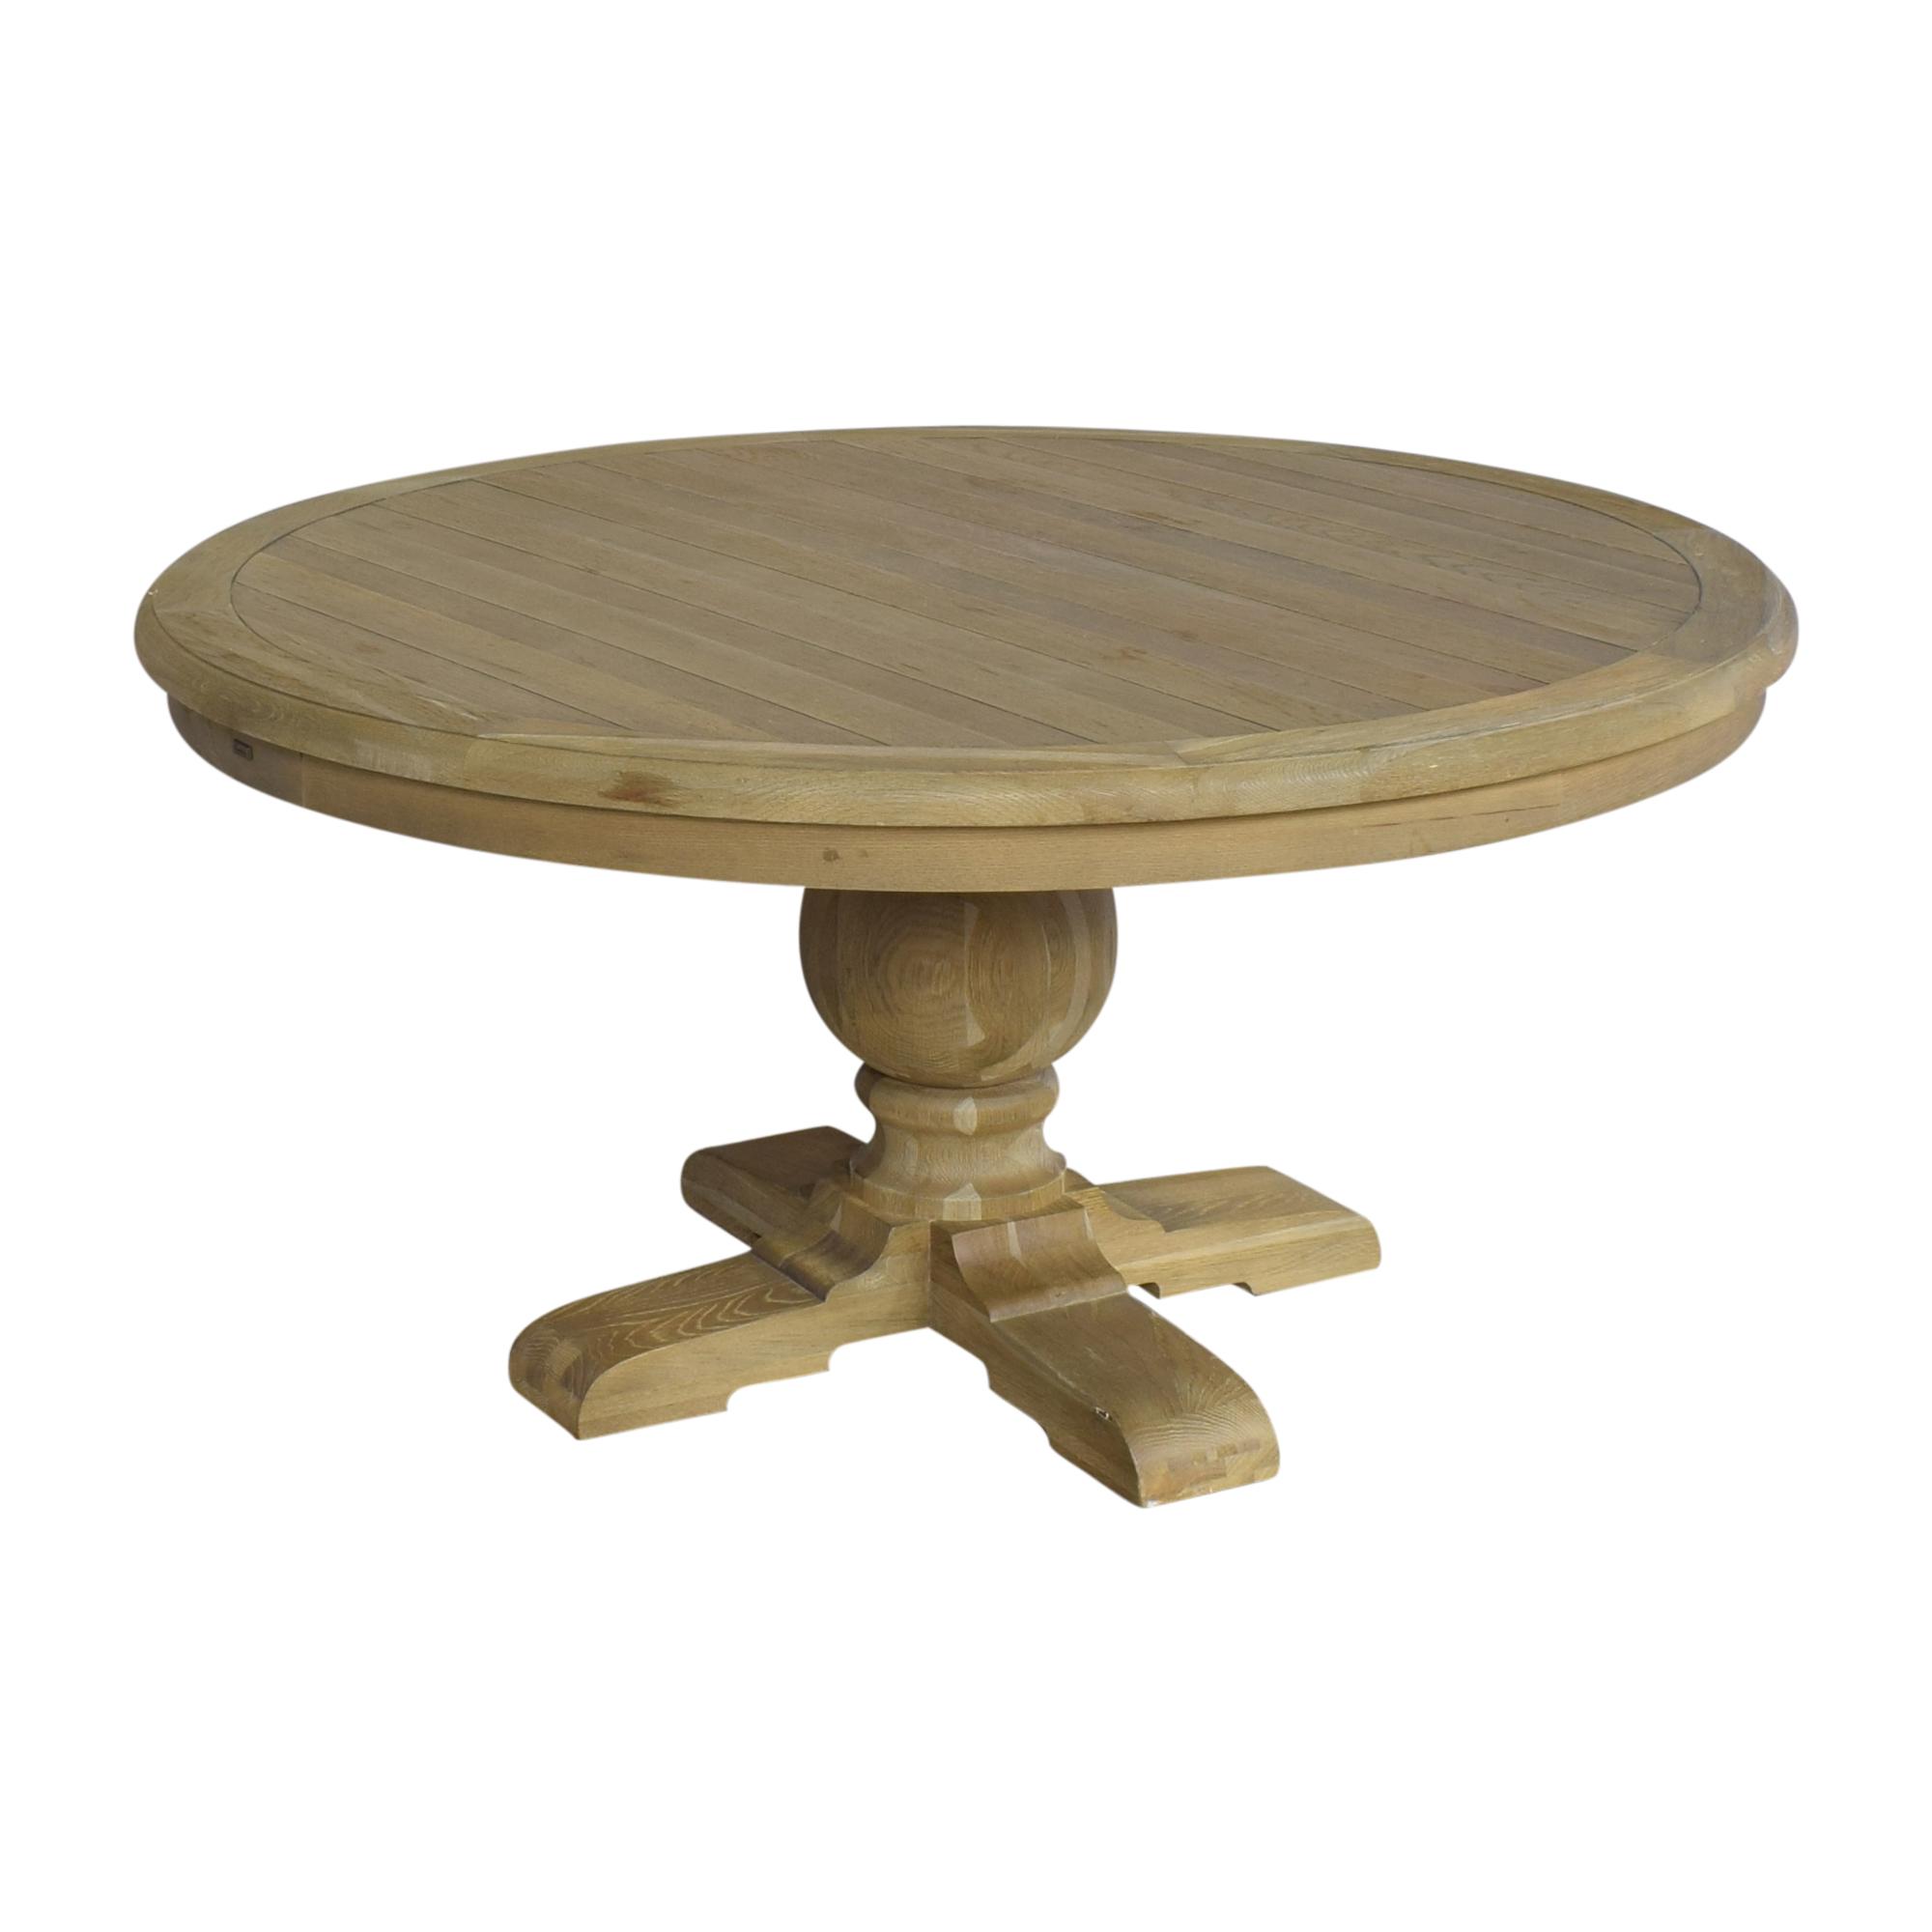 Zin Home Kingdom Round Pedestal Dining Table sale